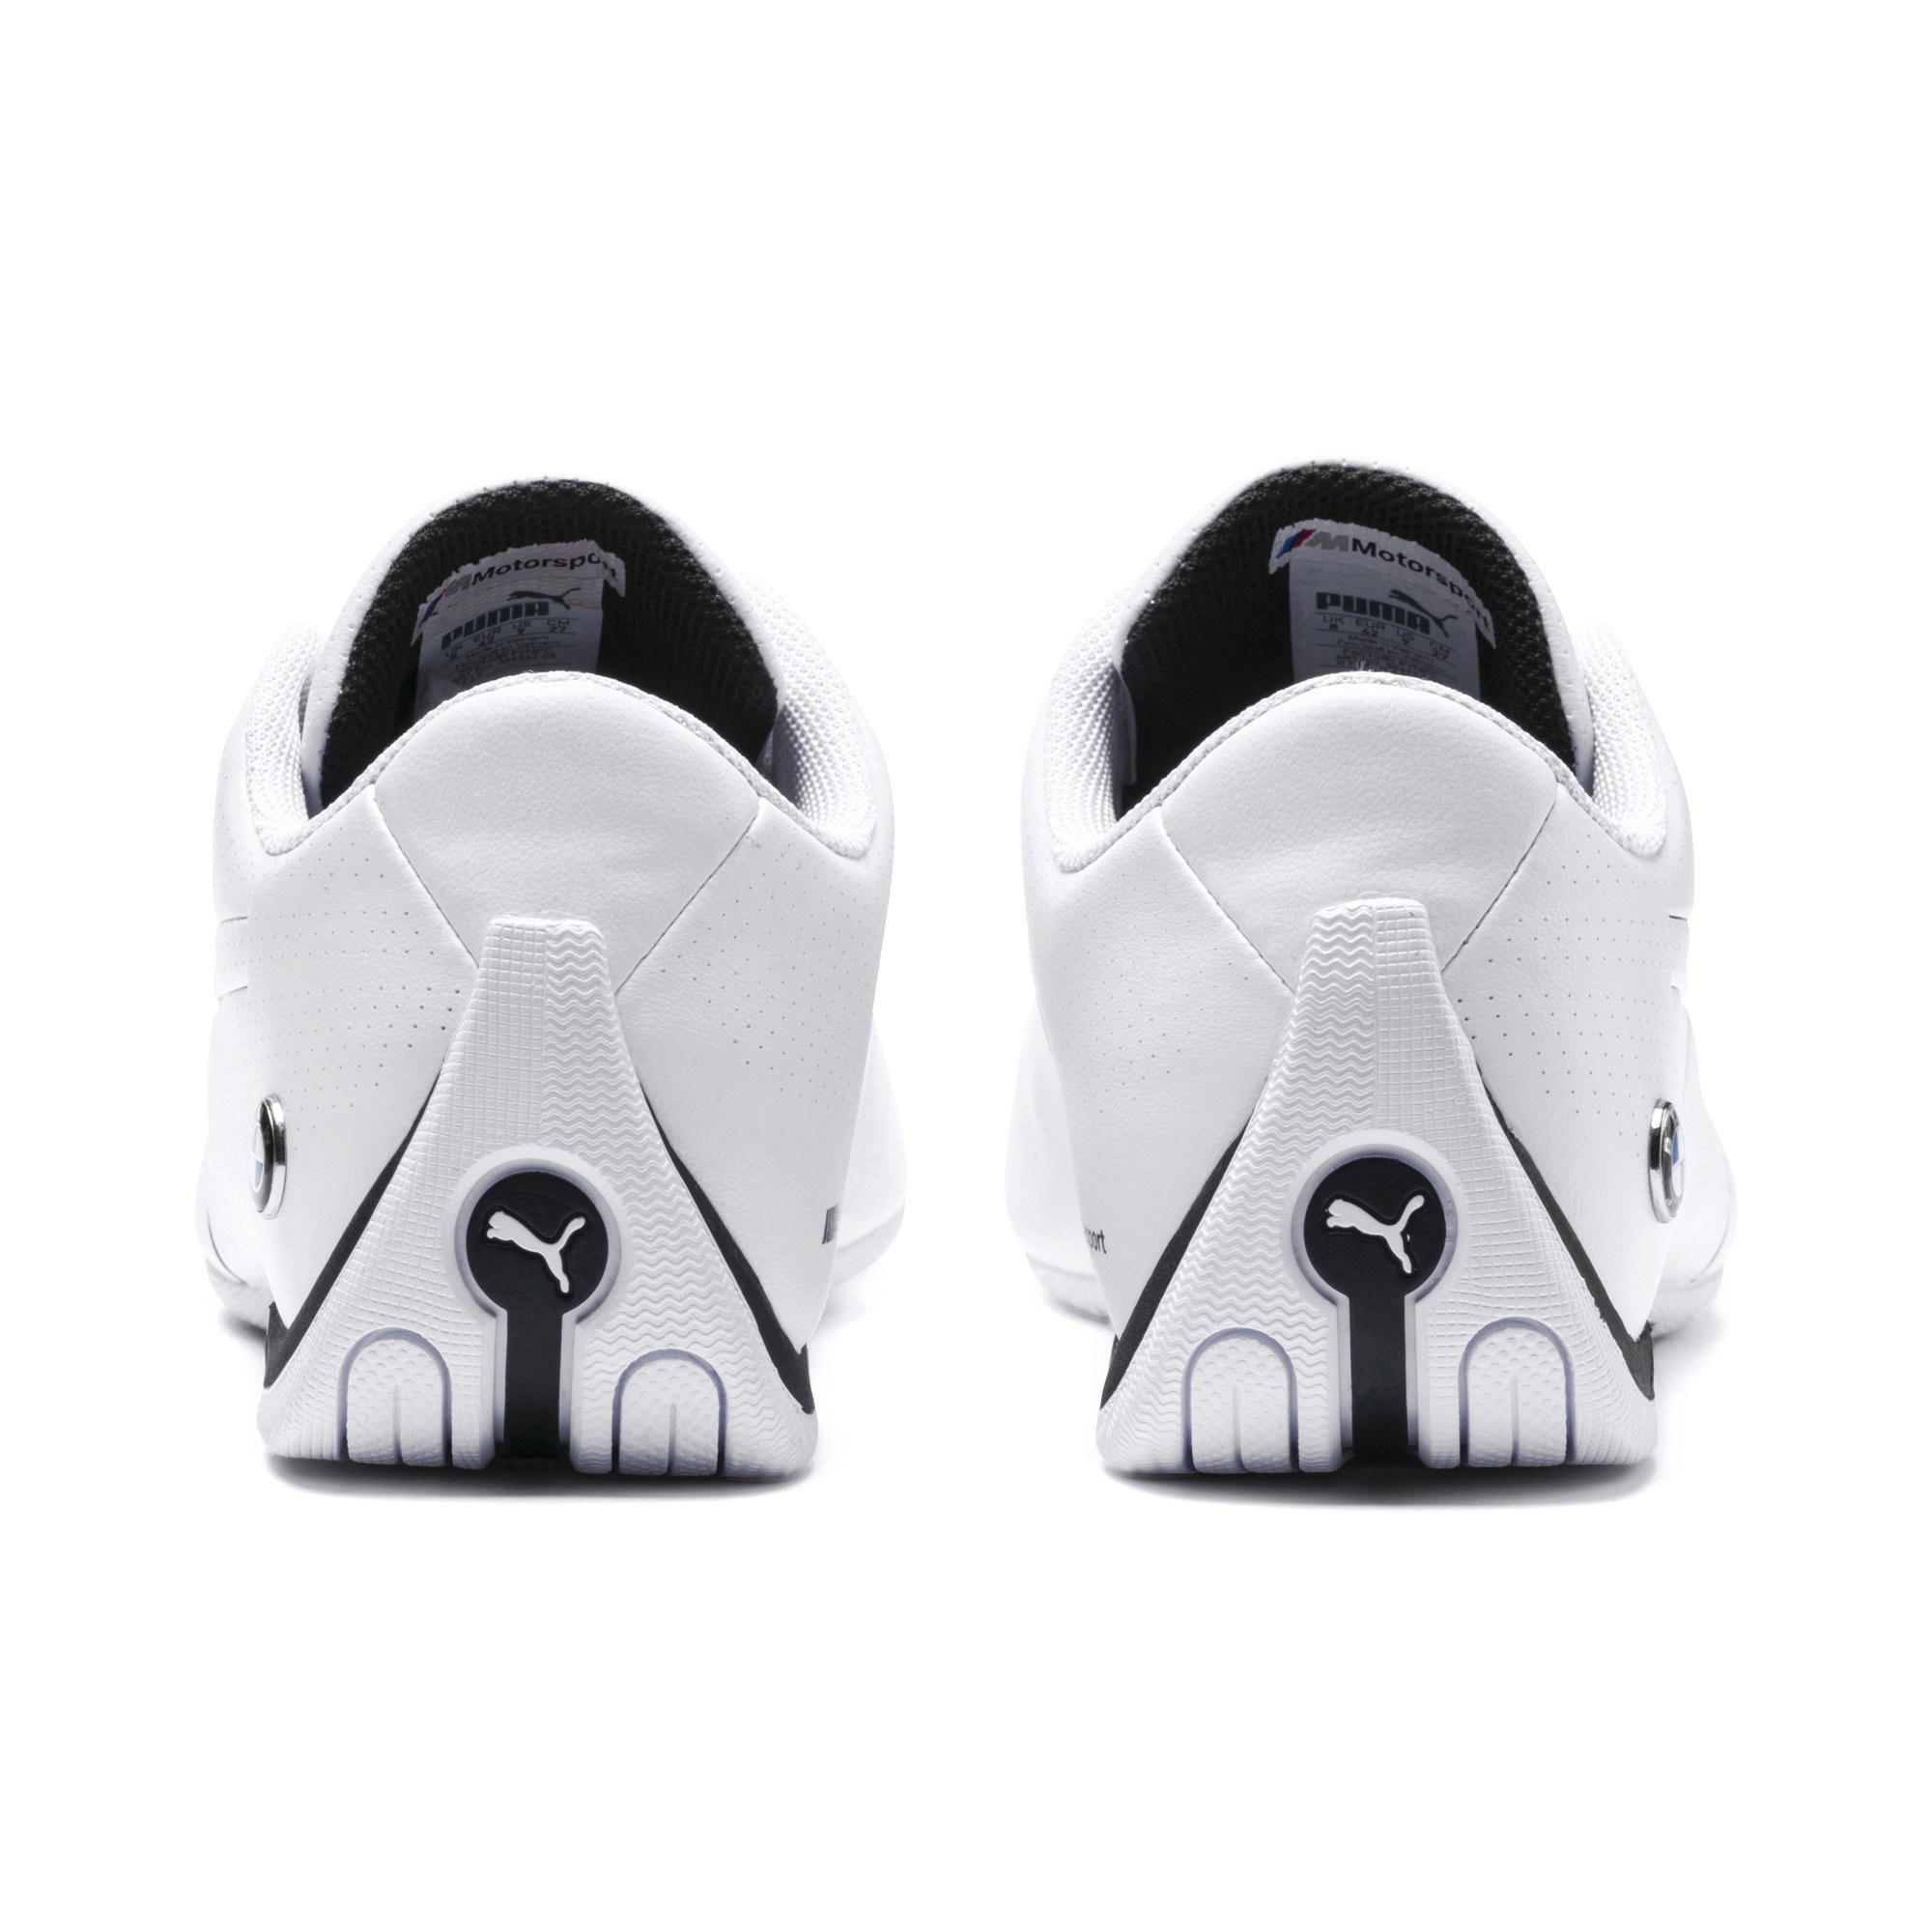 Indexbild 3 - PUMA BMW M Motorsport Future Cat Ultra Sneaker Unisex Schuhe Neu